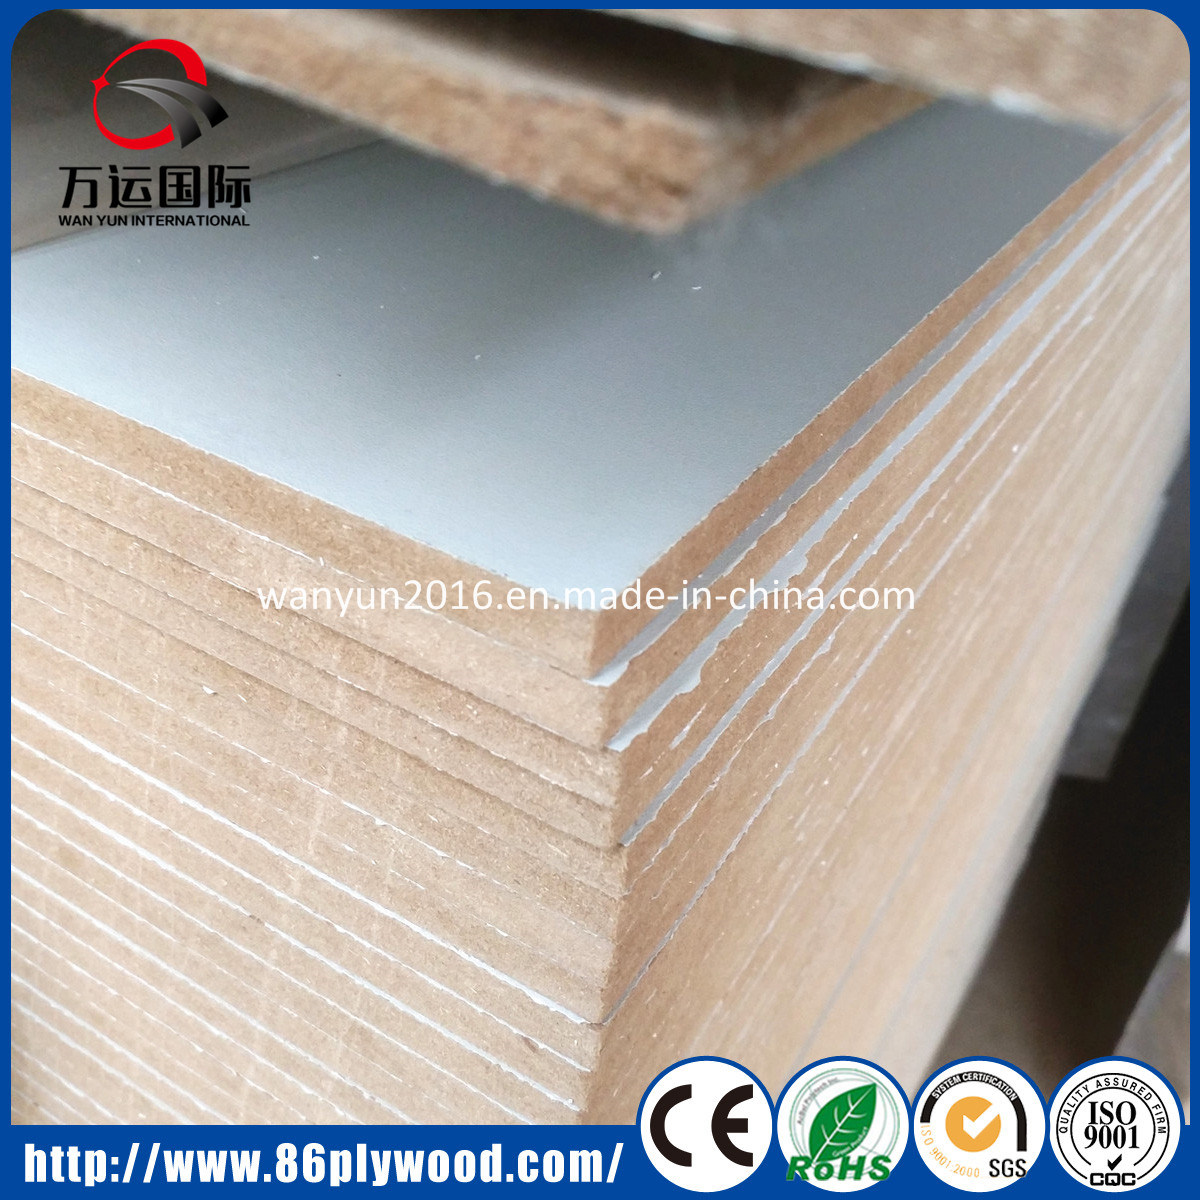 Waterproof Fiber Board Wood Texture Melamine Mdf 18mm